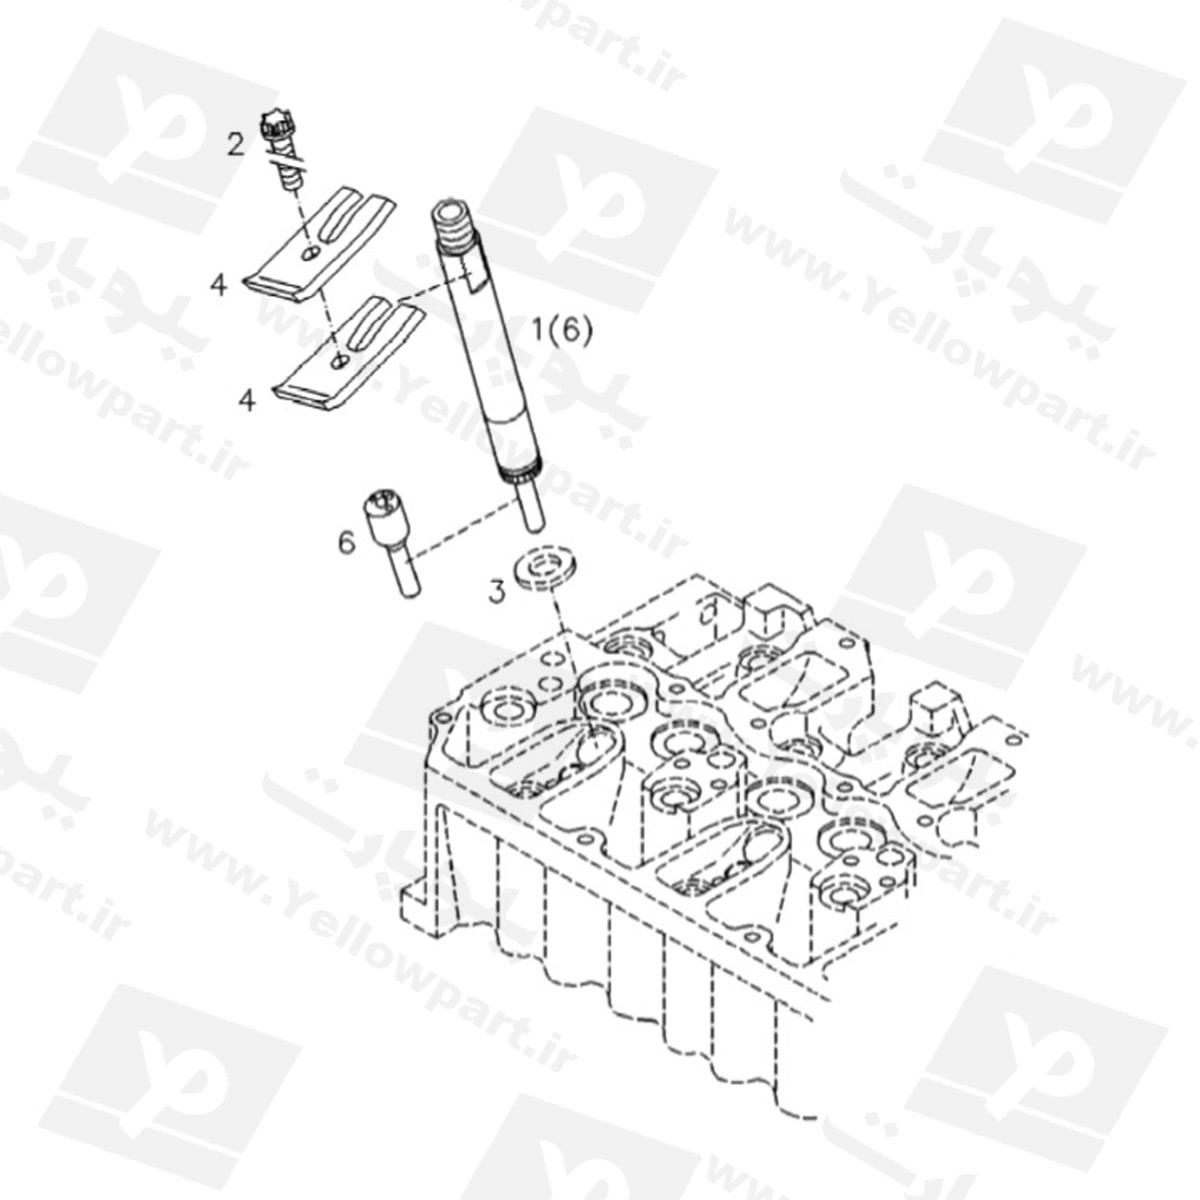 مجموعه سوزن انژکتور HG180D1